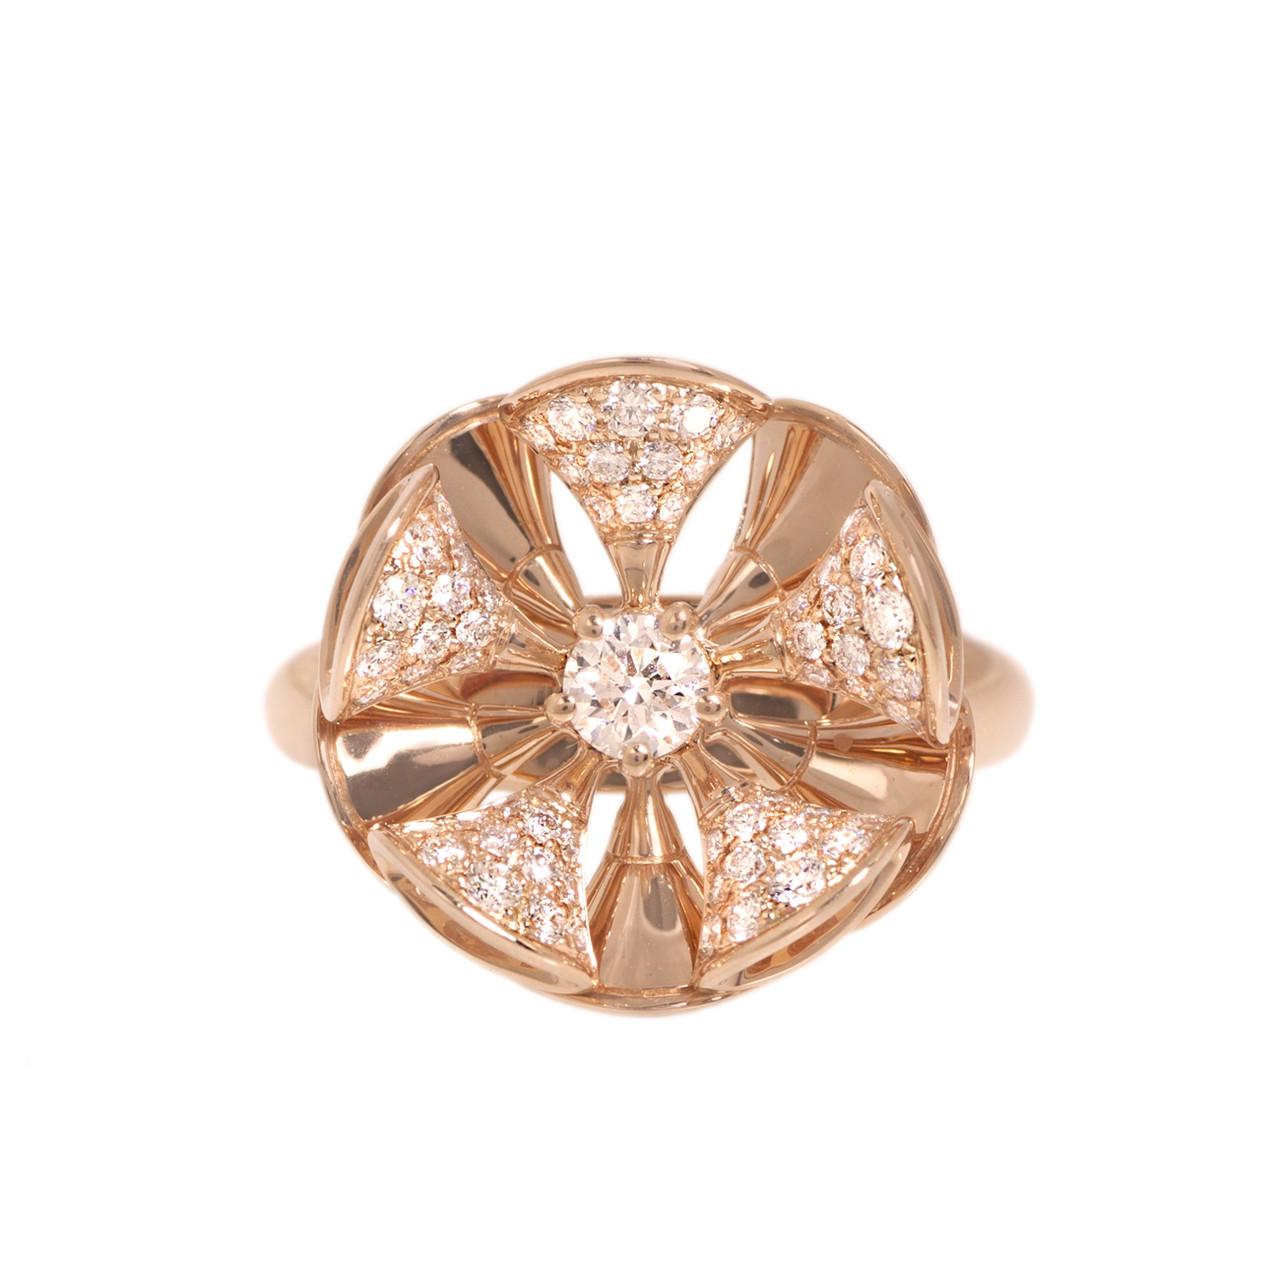 bvlgari bulgari 18k rose gold u0026 diamond divasu0027 dream ring